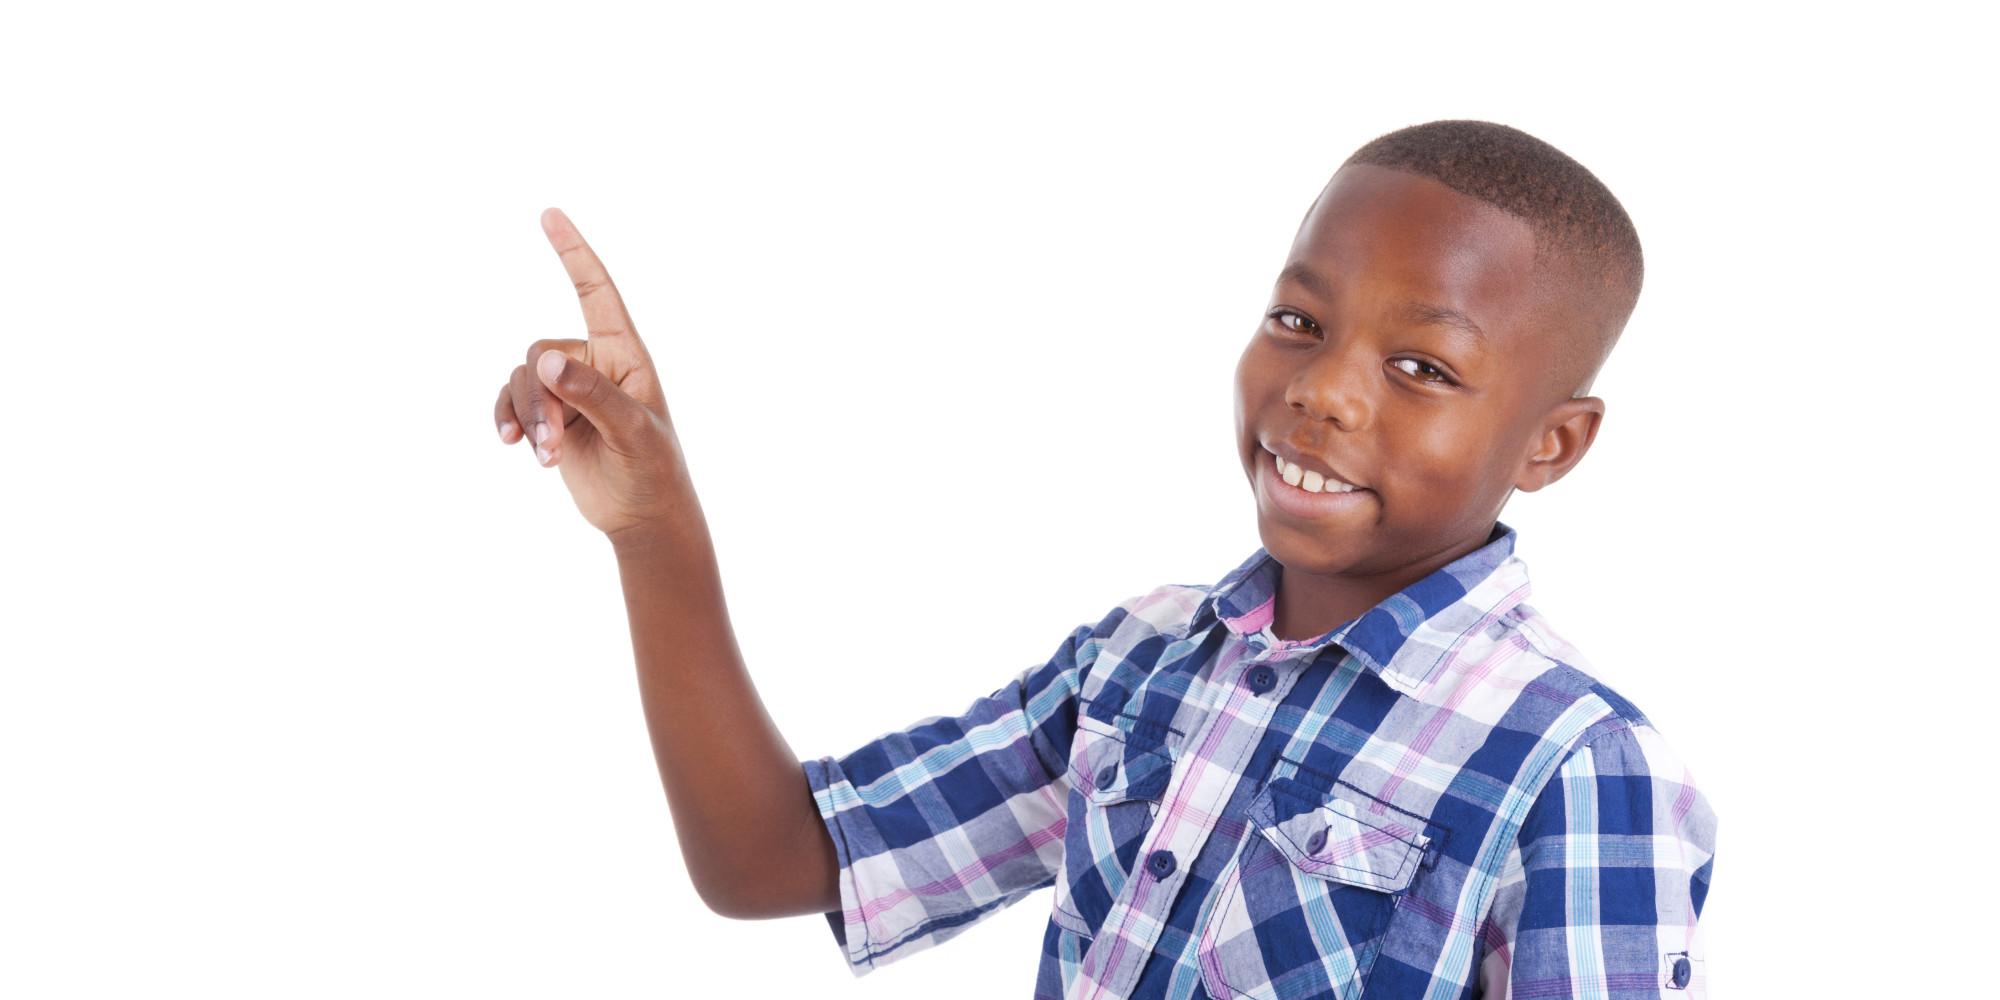 Black People Pointing Their Fingers Keep Getting Accused Of Gang